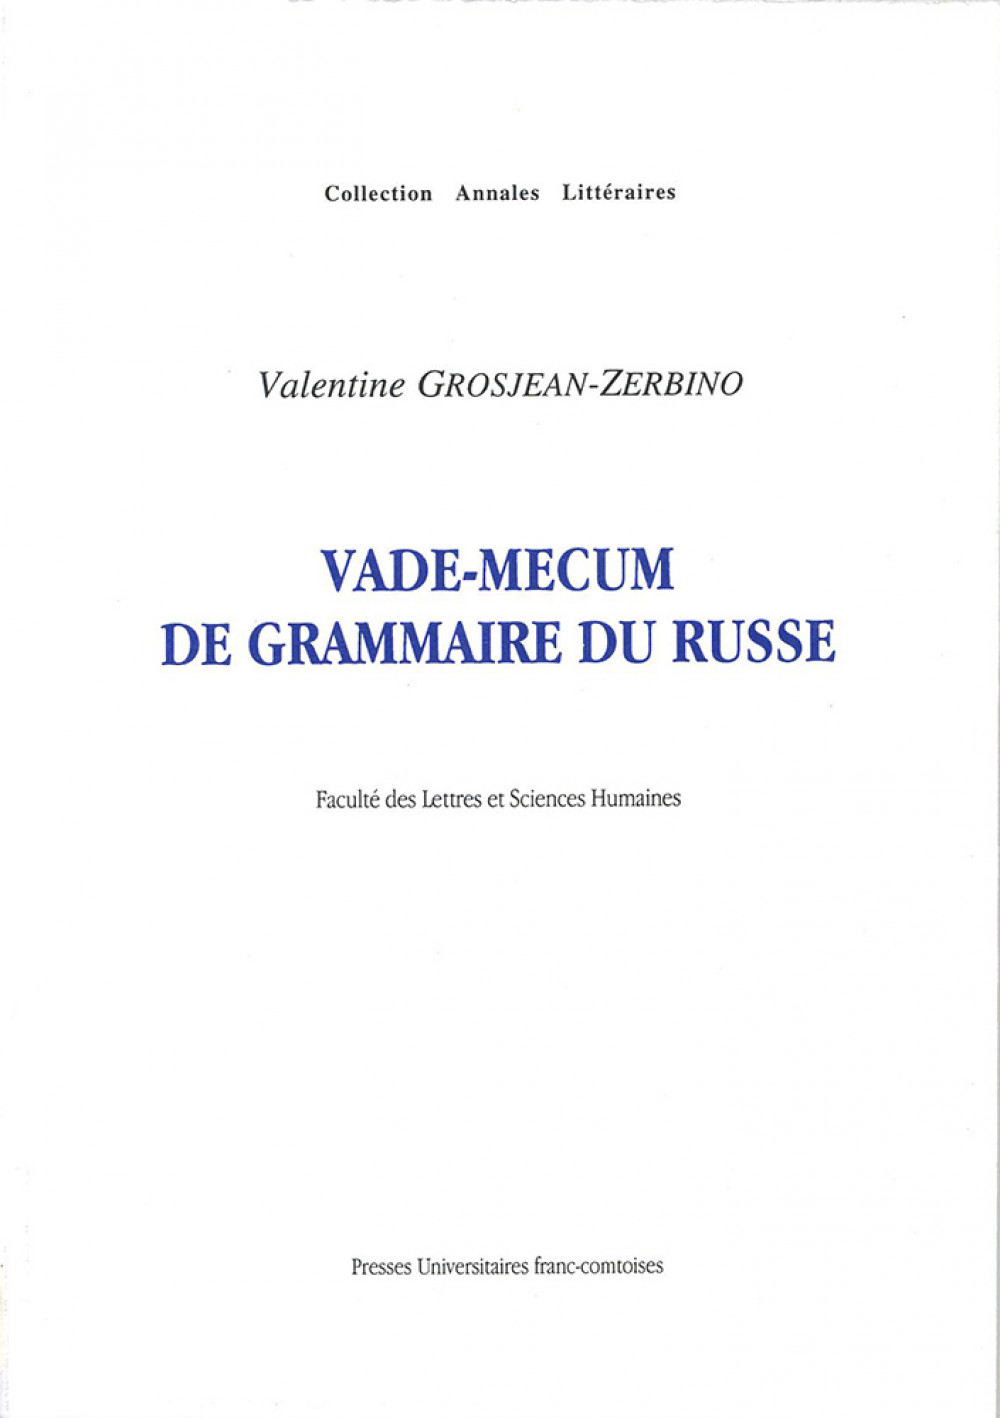 Vade-mecum de grammaire du russe